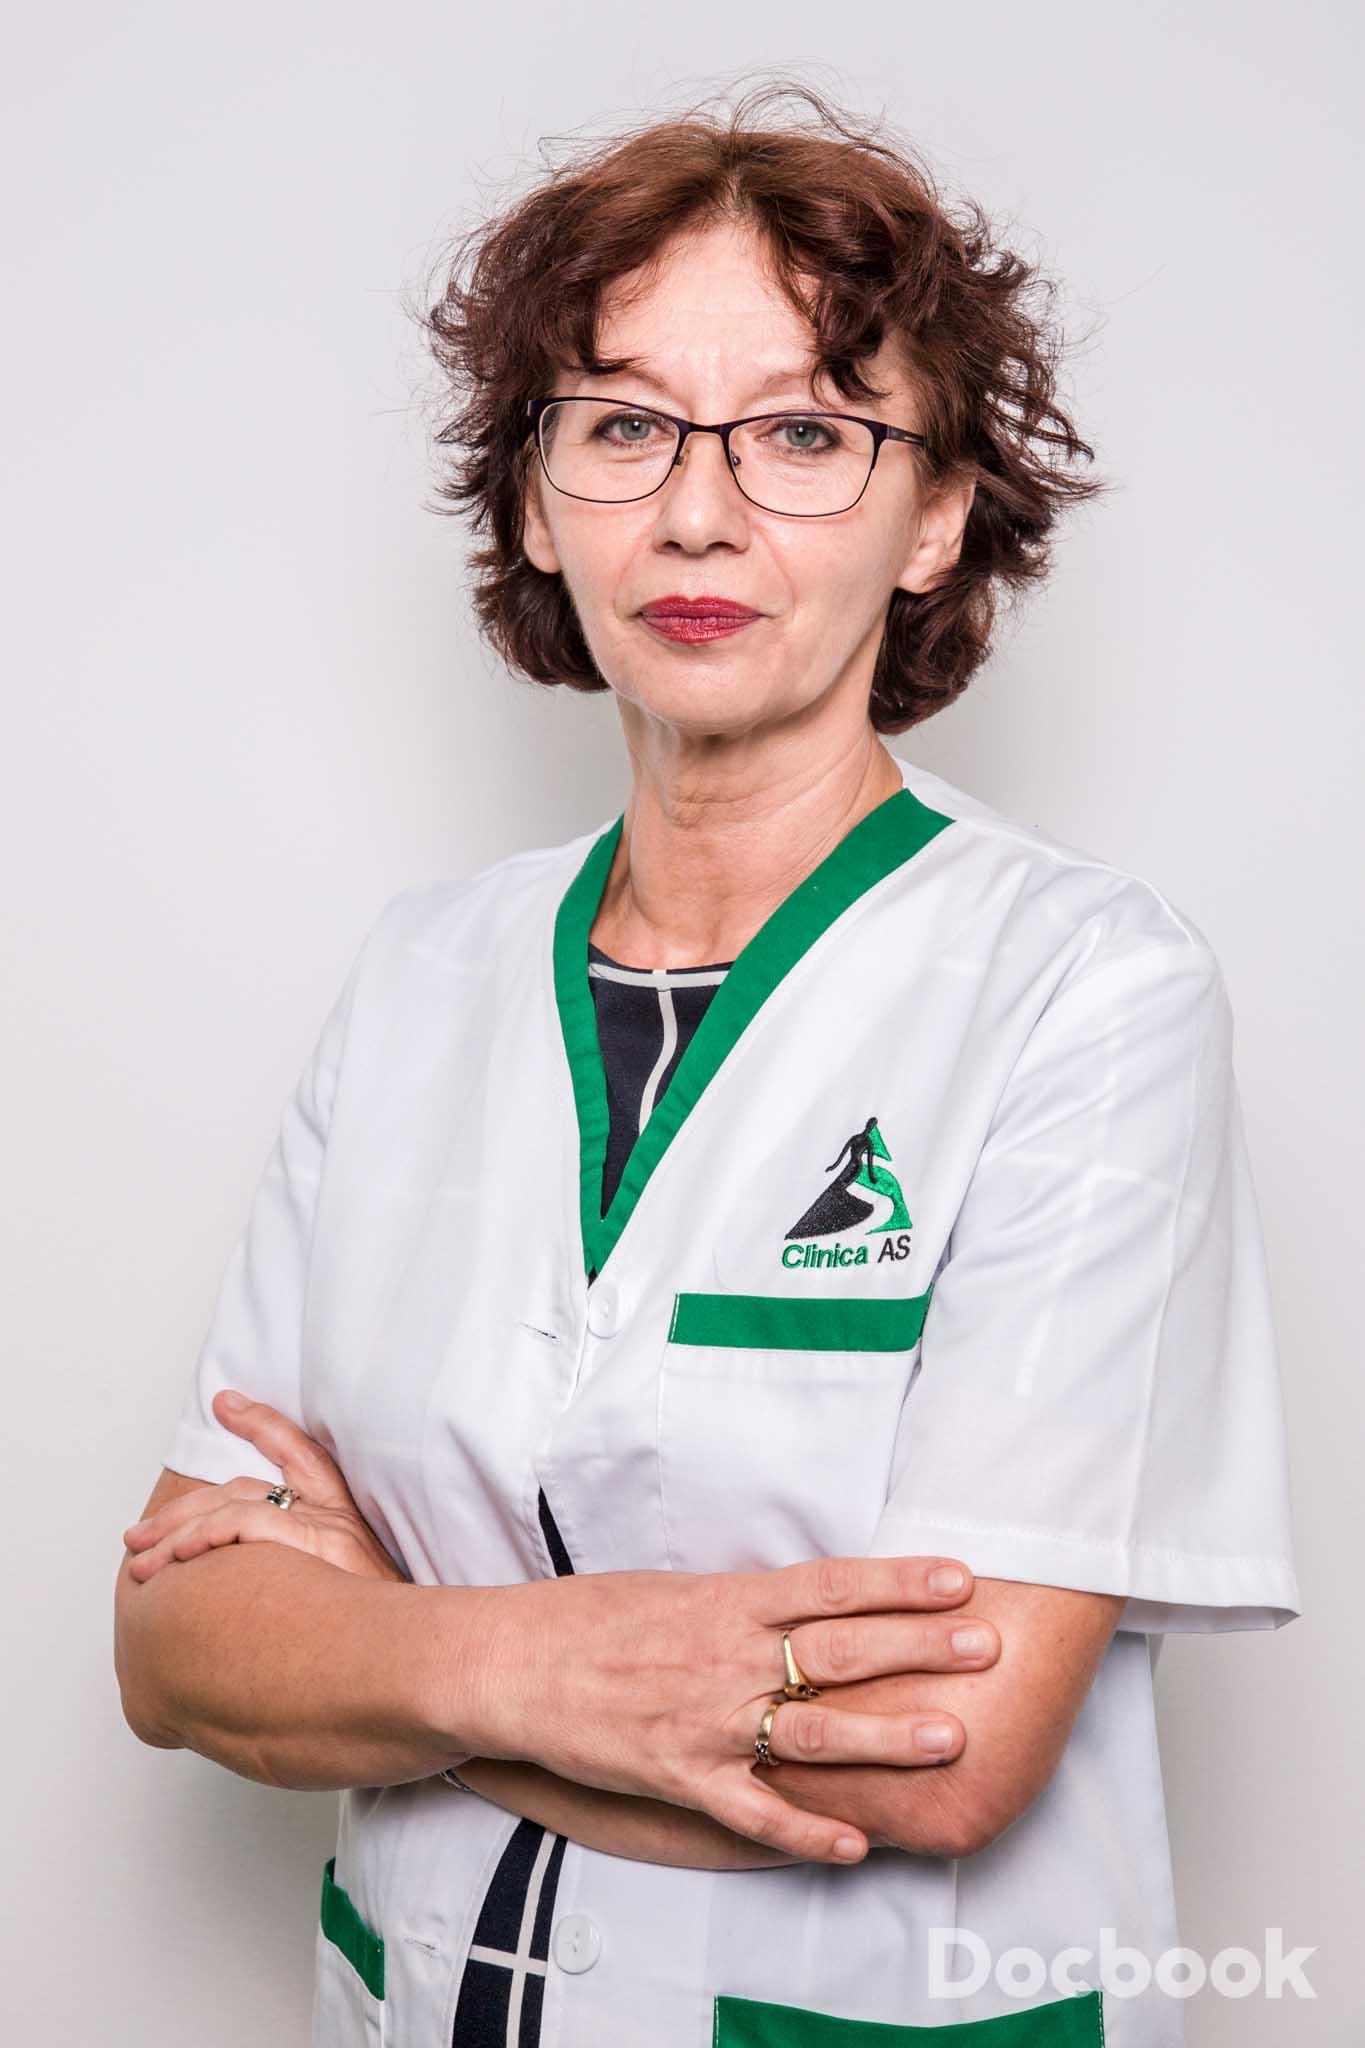 Dr. Anton Marina